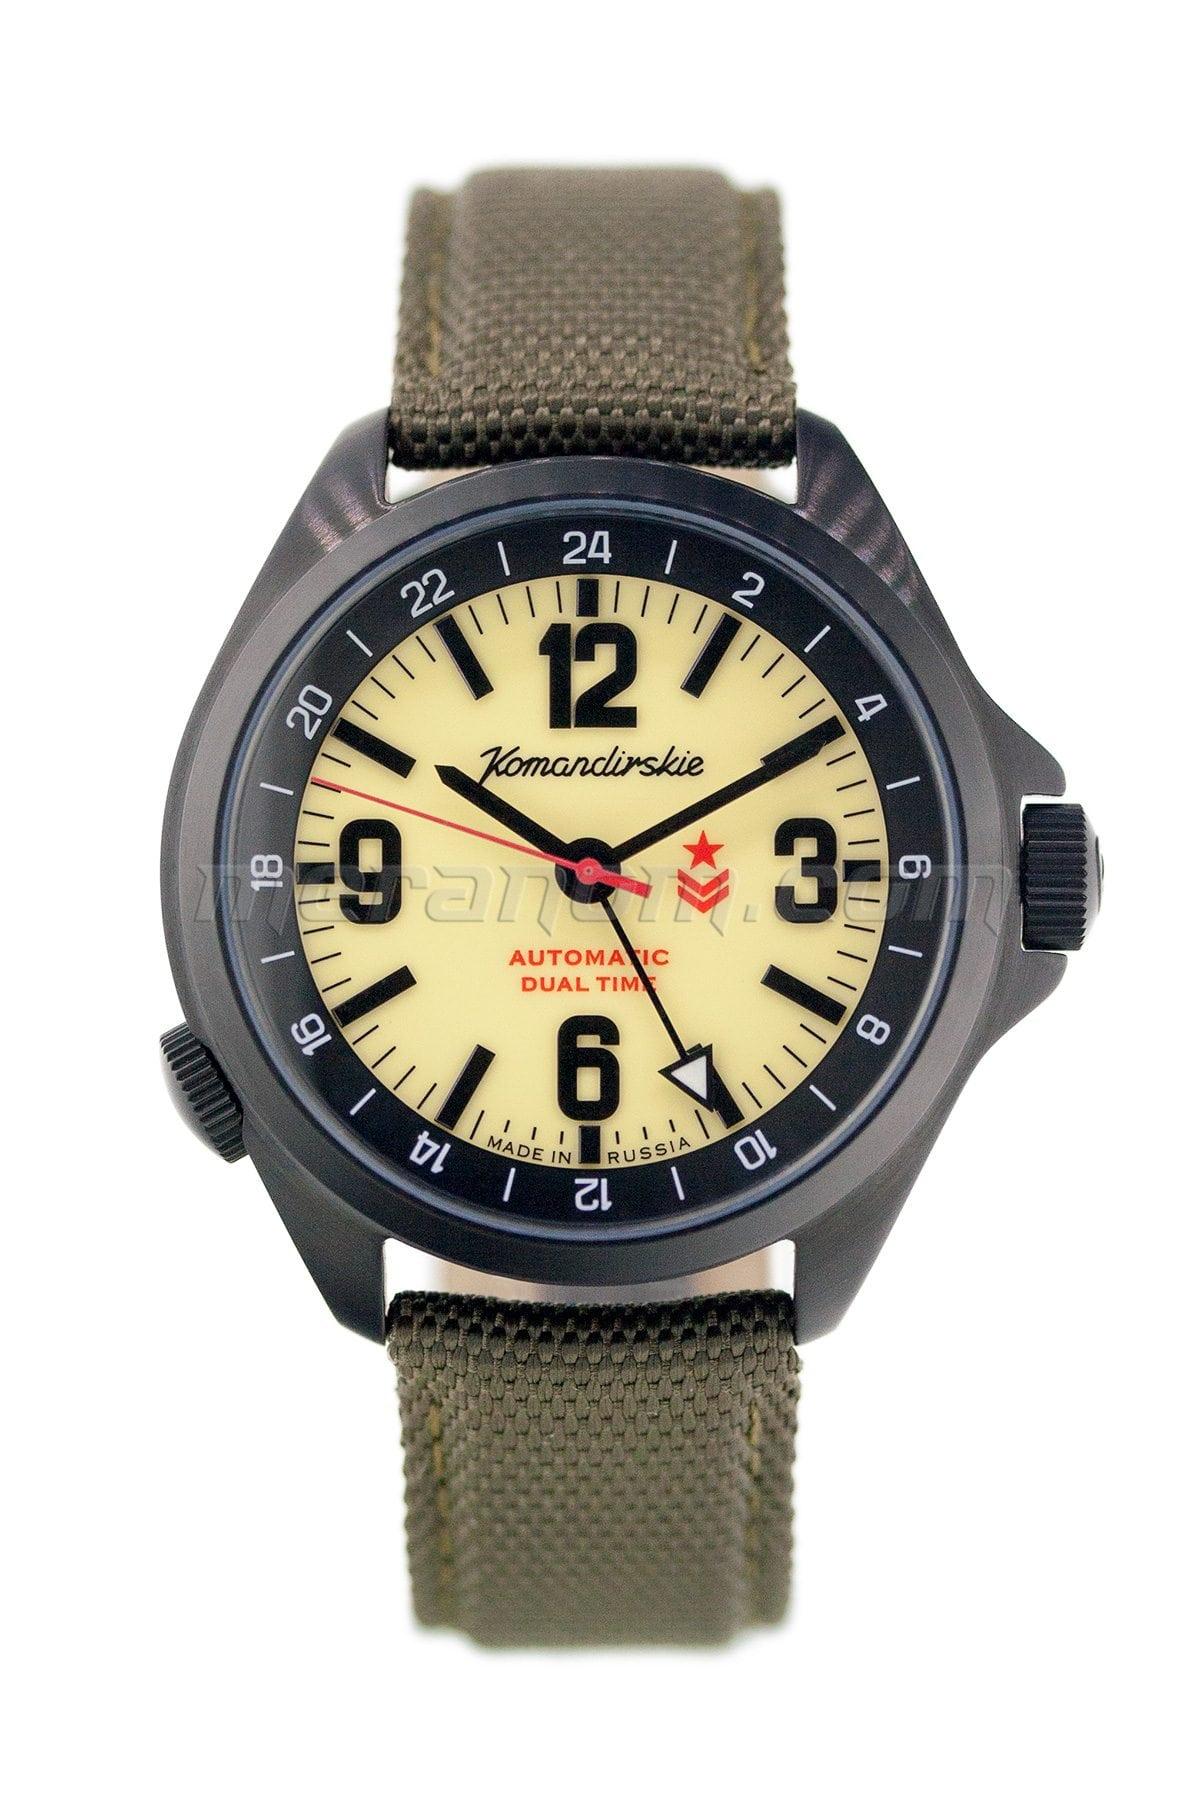 Vostok watch komandirskie k 34 2426 476613 buy from an authorized dealer for Komandirskie watches